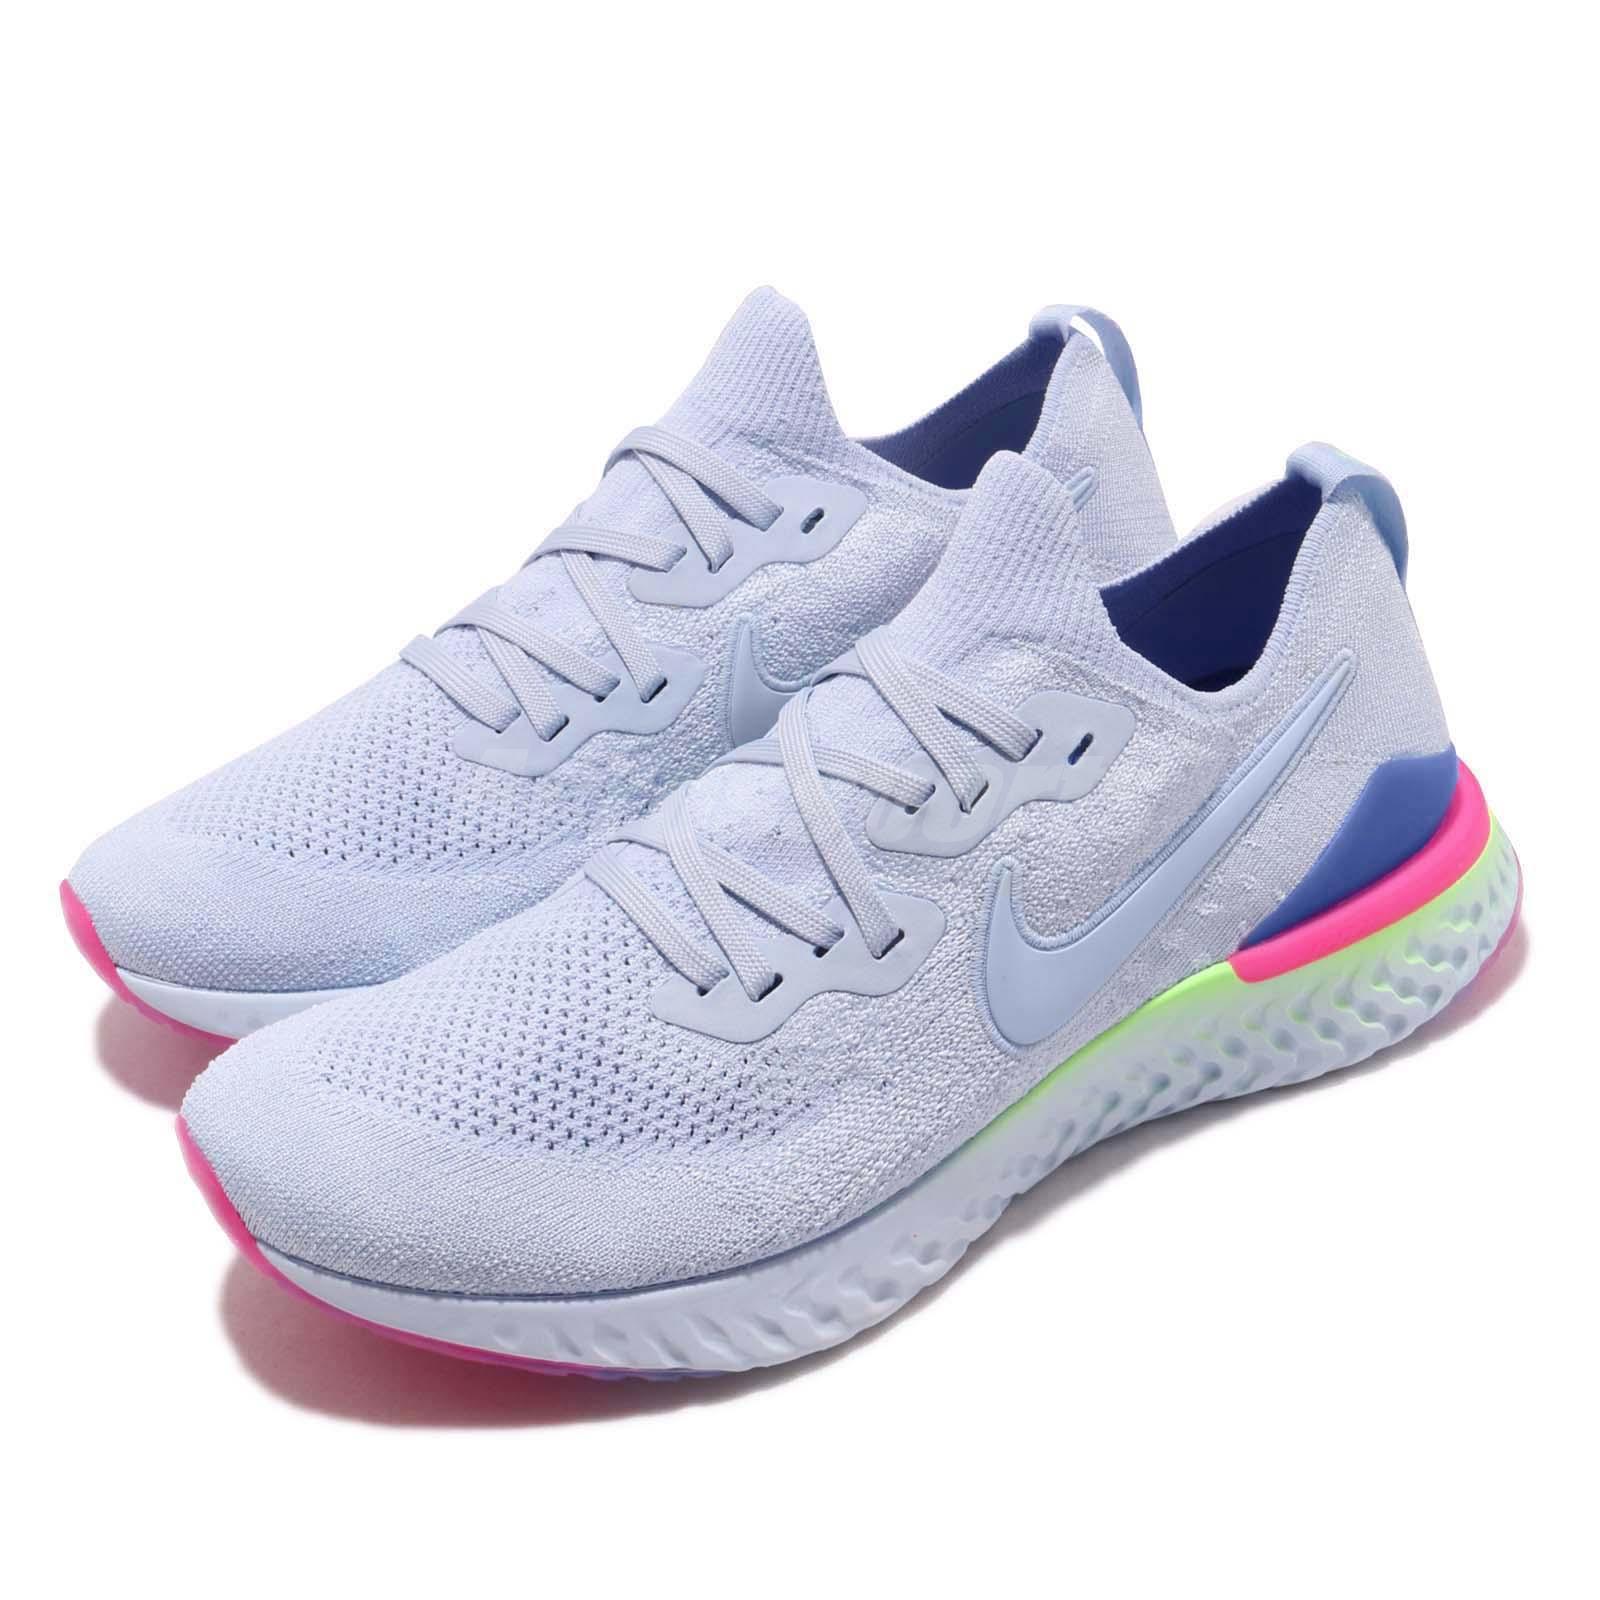 new styles 64677 a98fc Details about Nike Epic React Flyknit 2 II Hydrogen Blue Men Running Shoes  Sneakers BQ8928-453